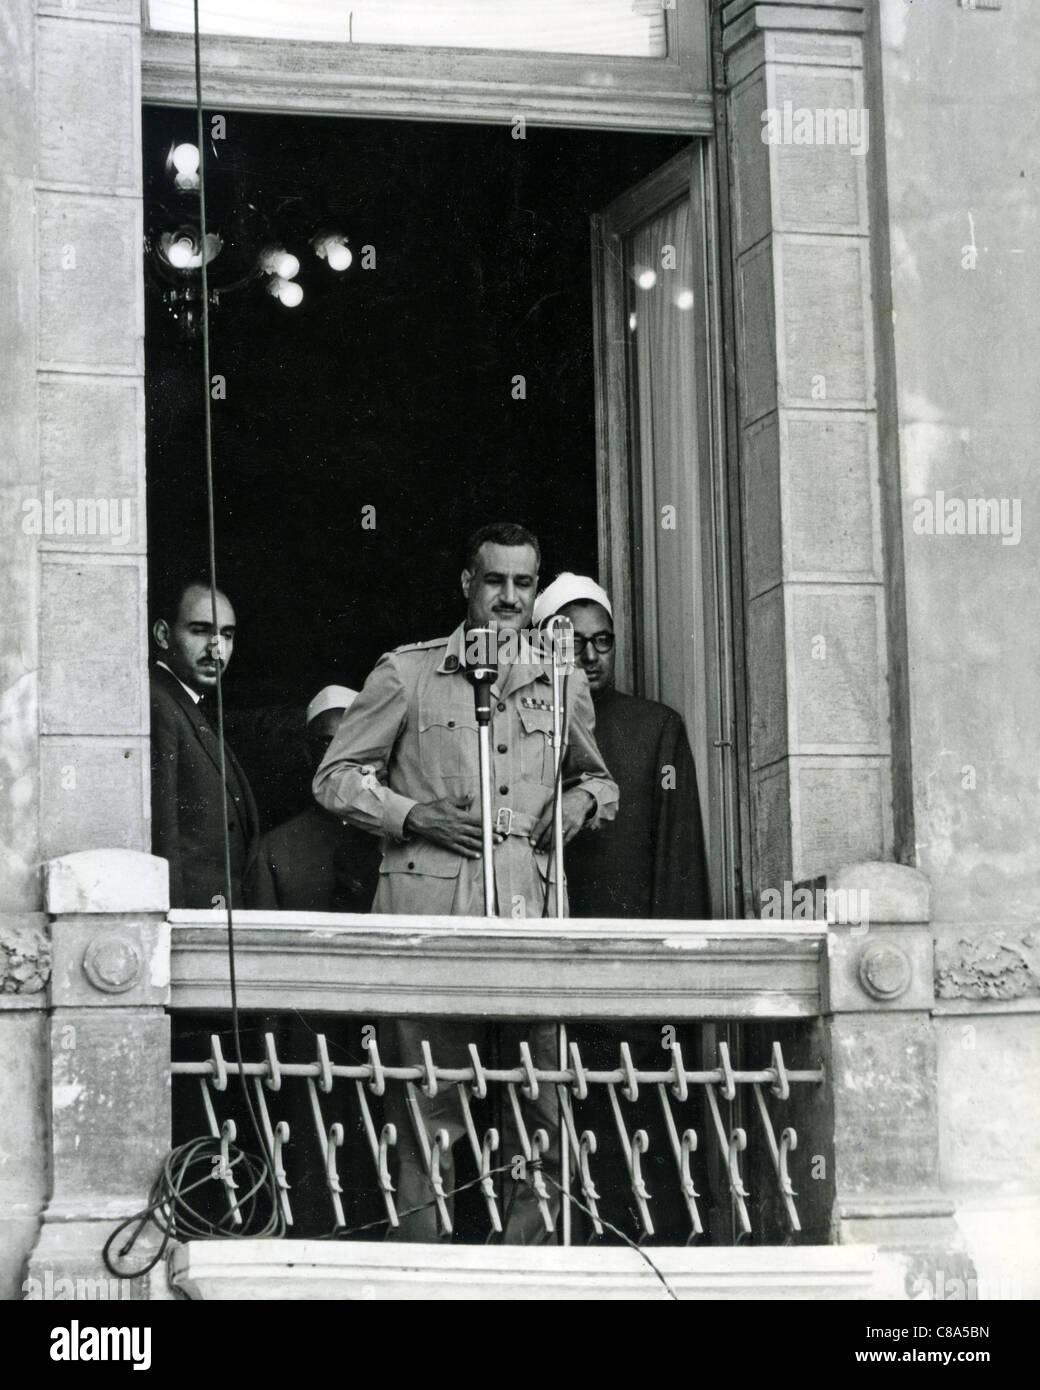 GAMAL ABDEL NASSER (1918-1970) second President of Egypt about 1951 - Stock Image